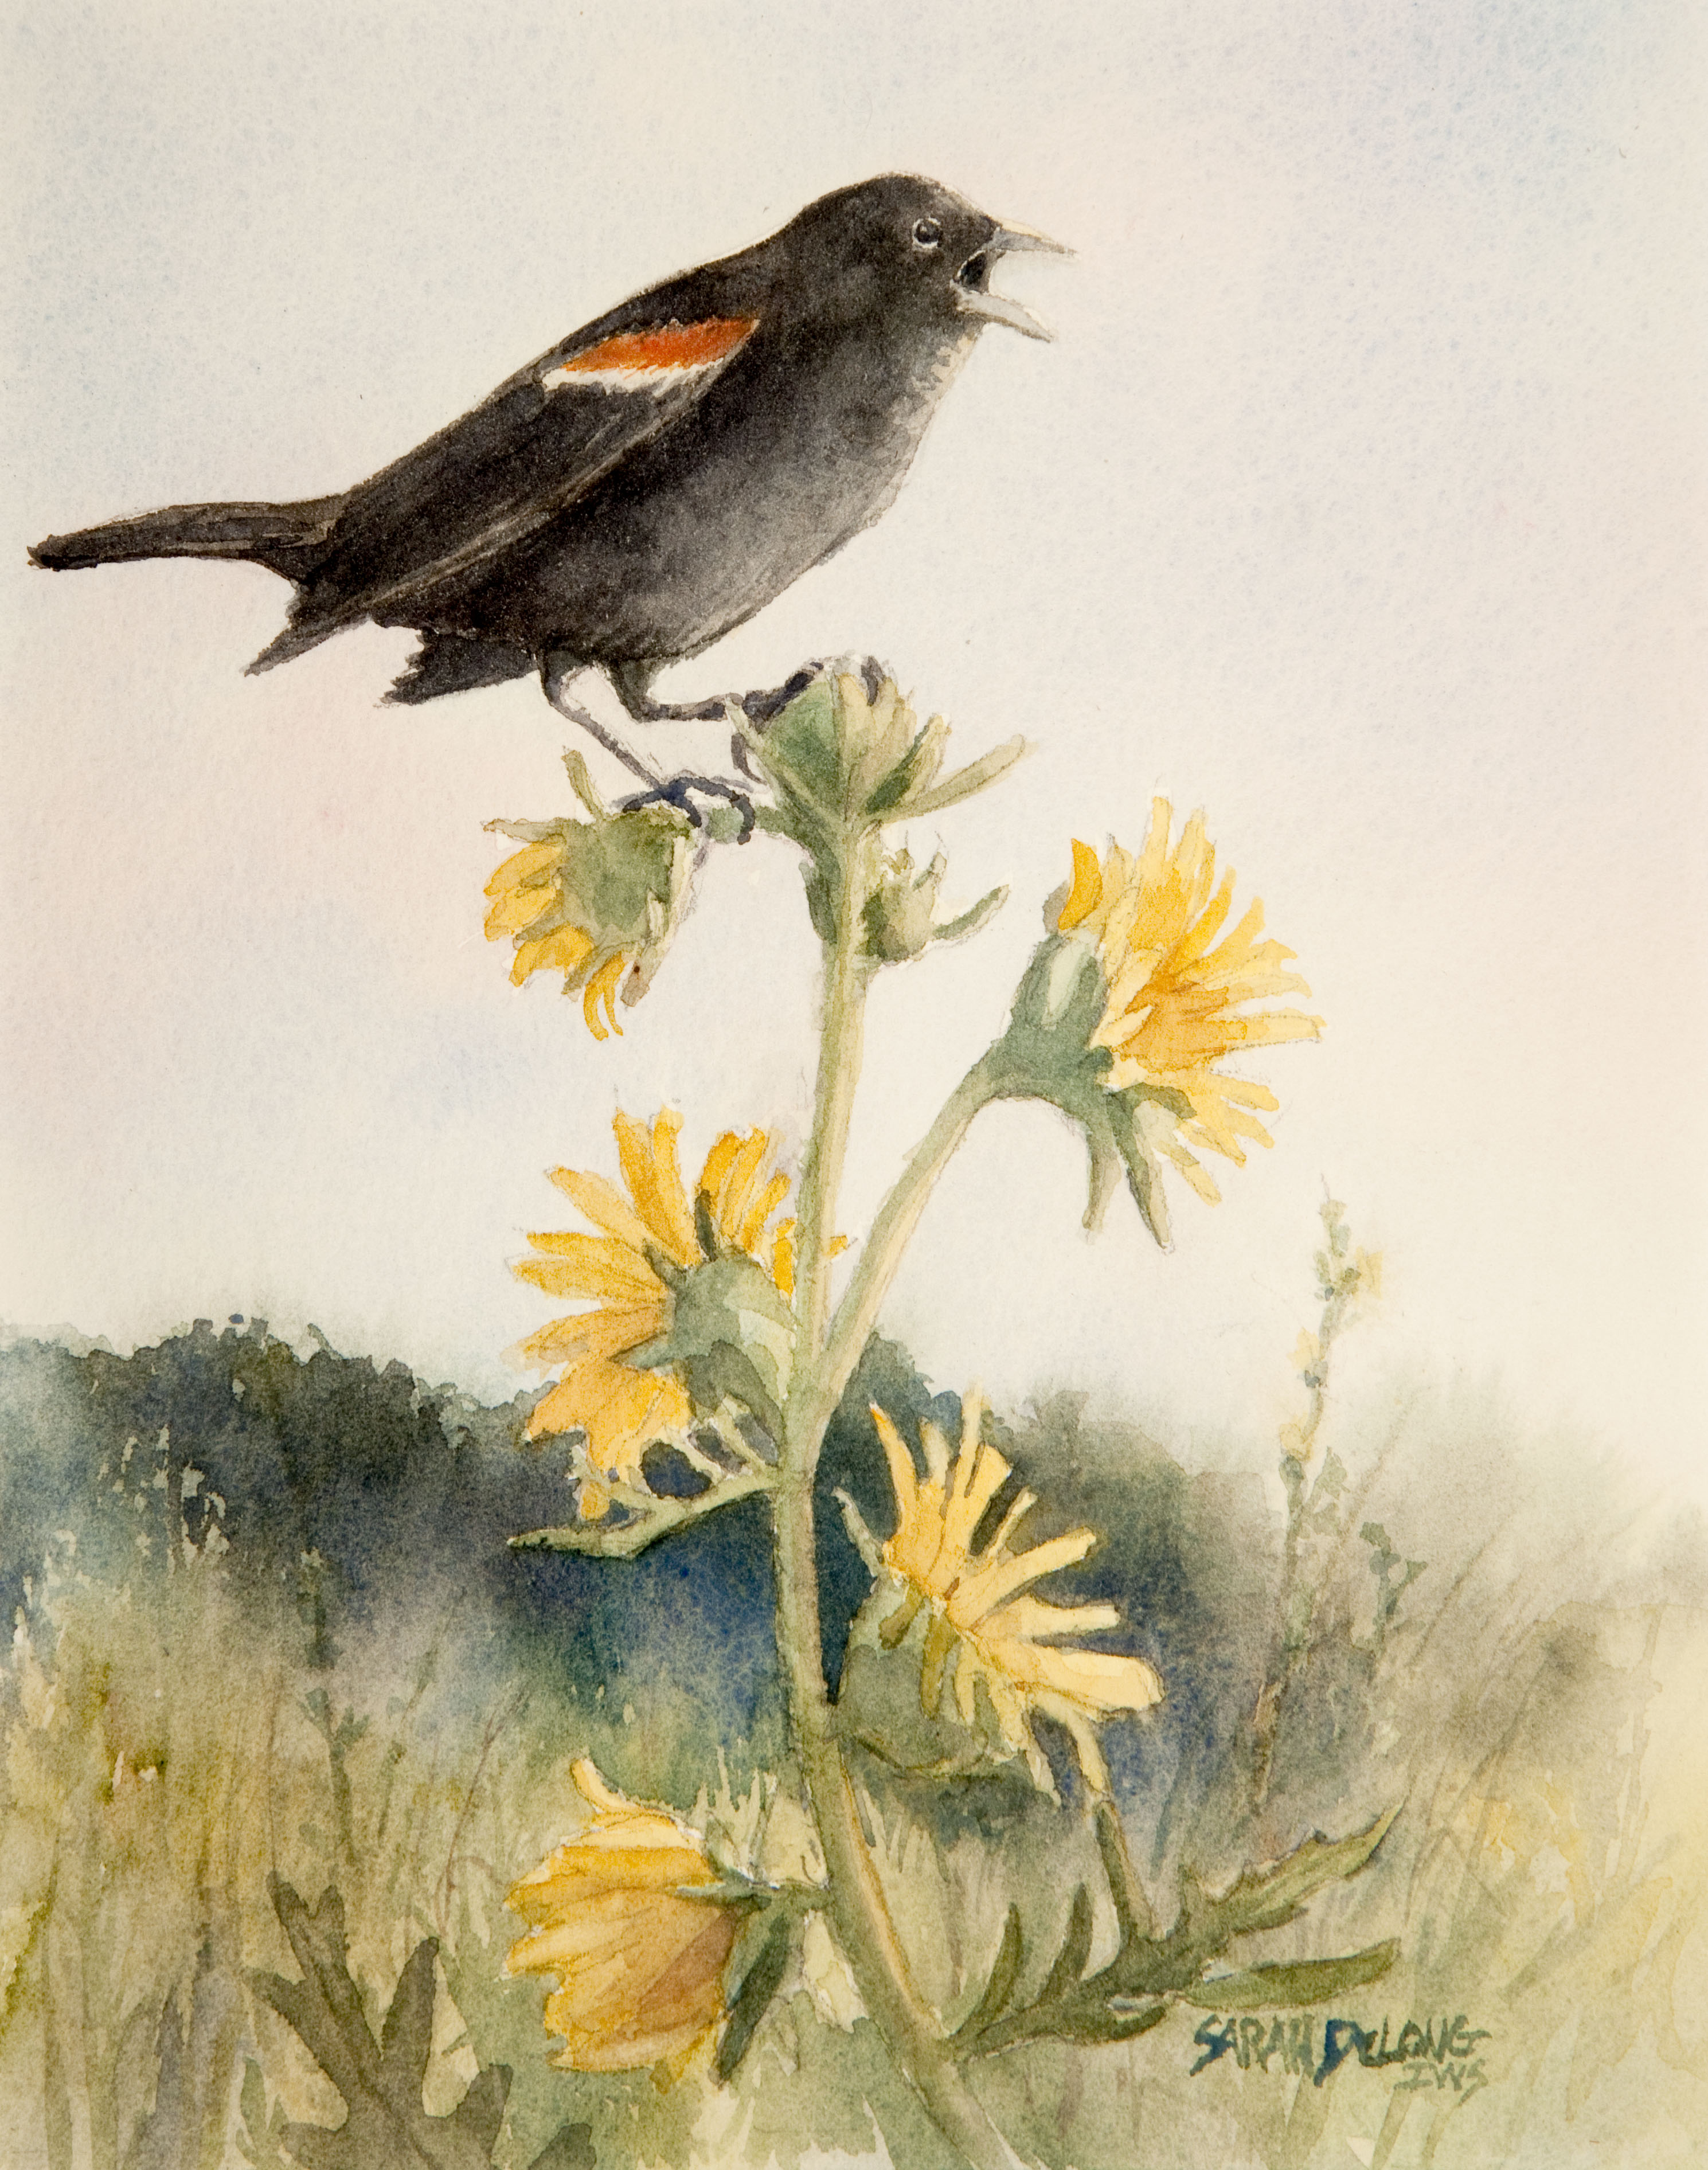 Redwing Black Bird on Compass Plant